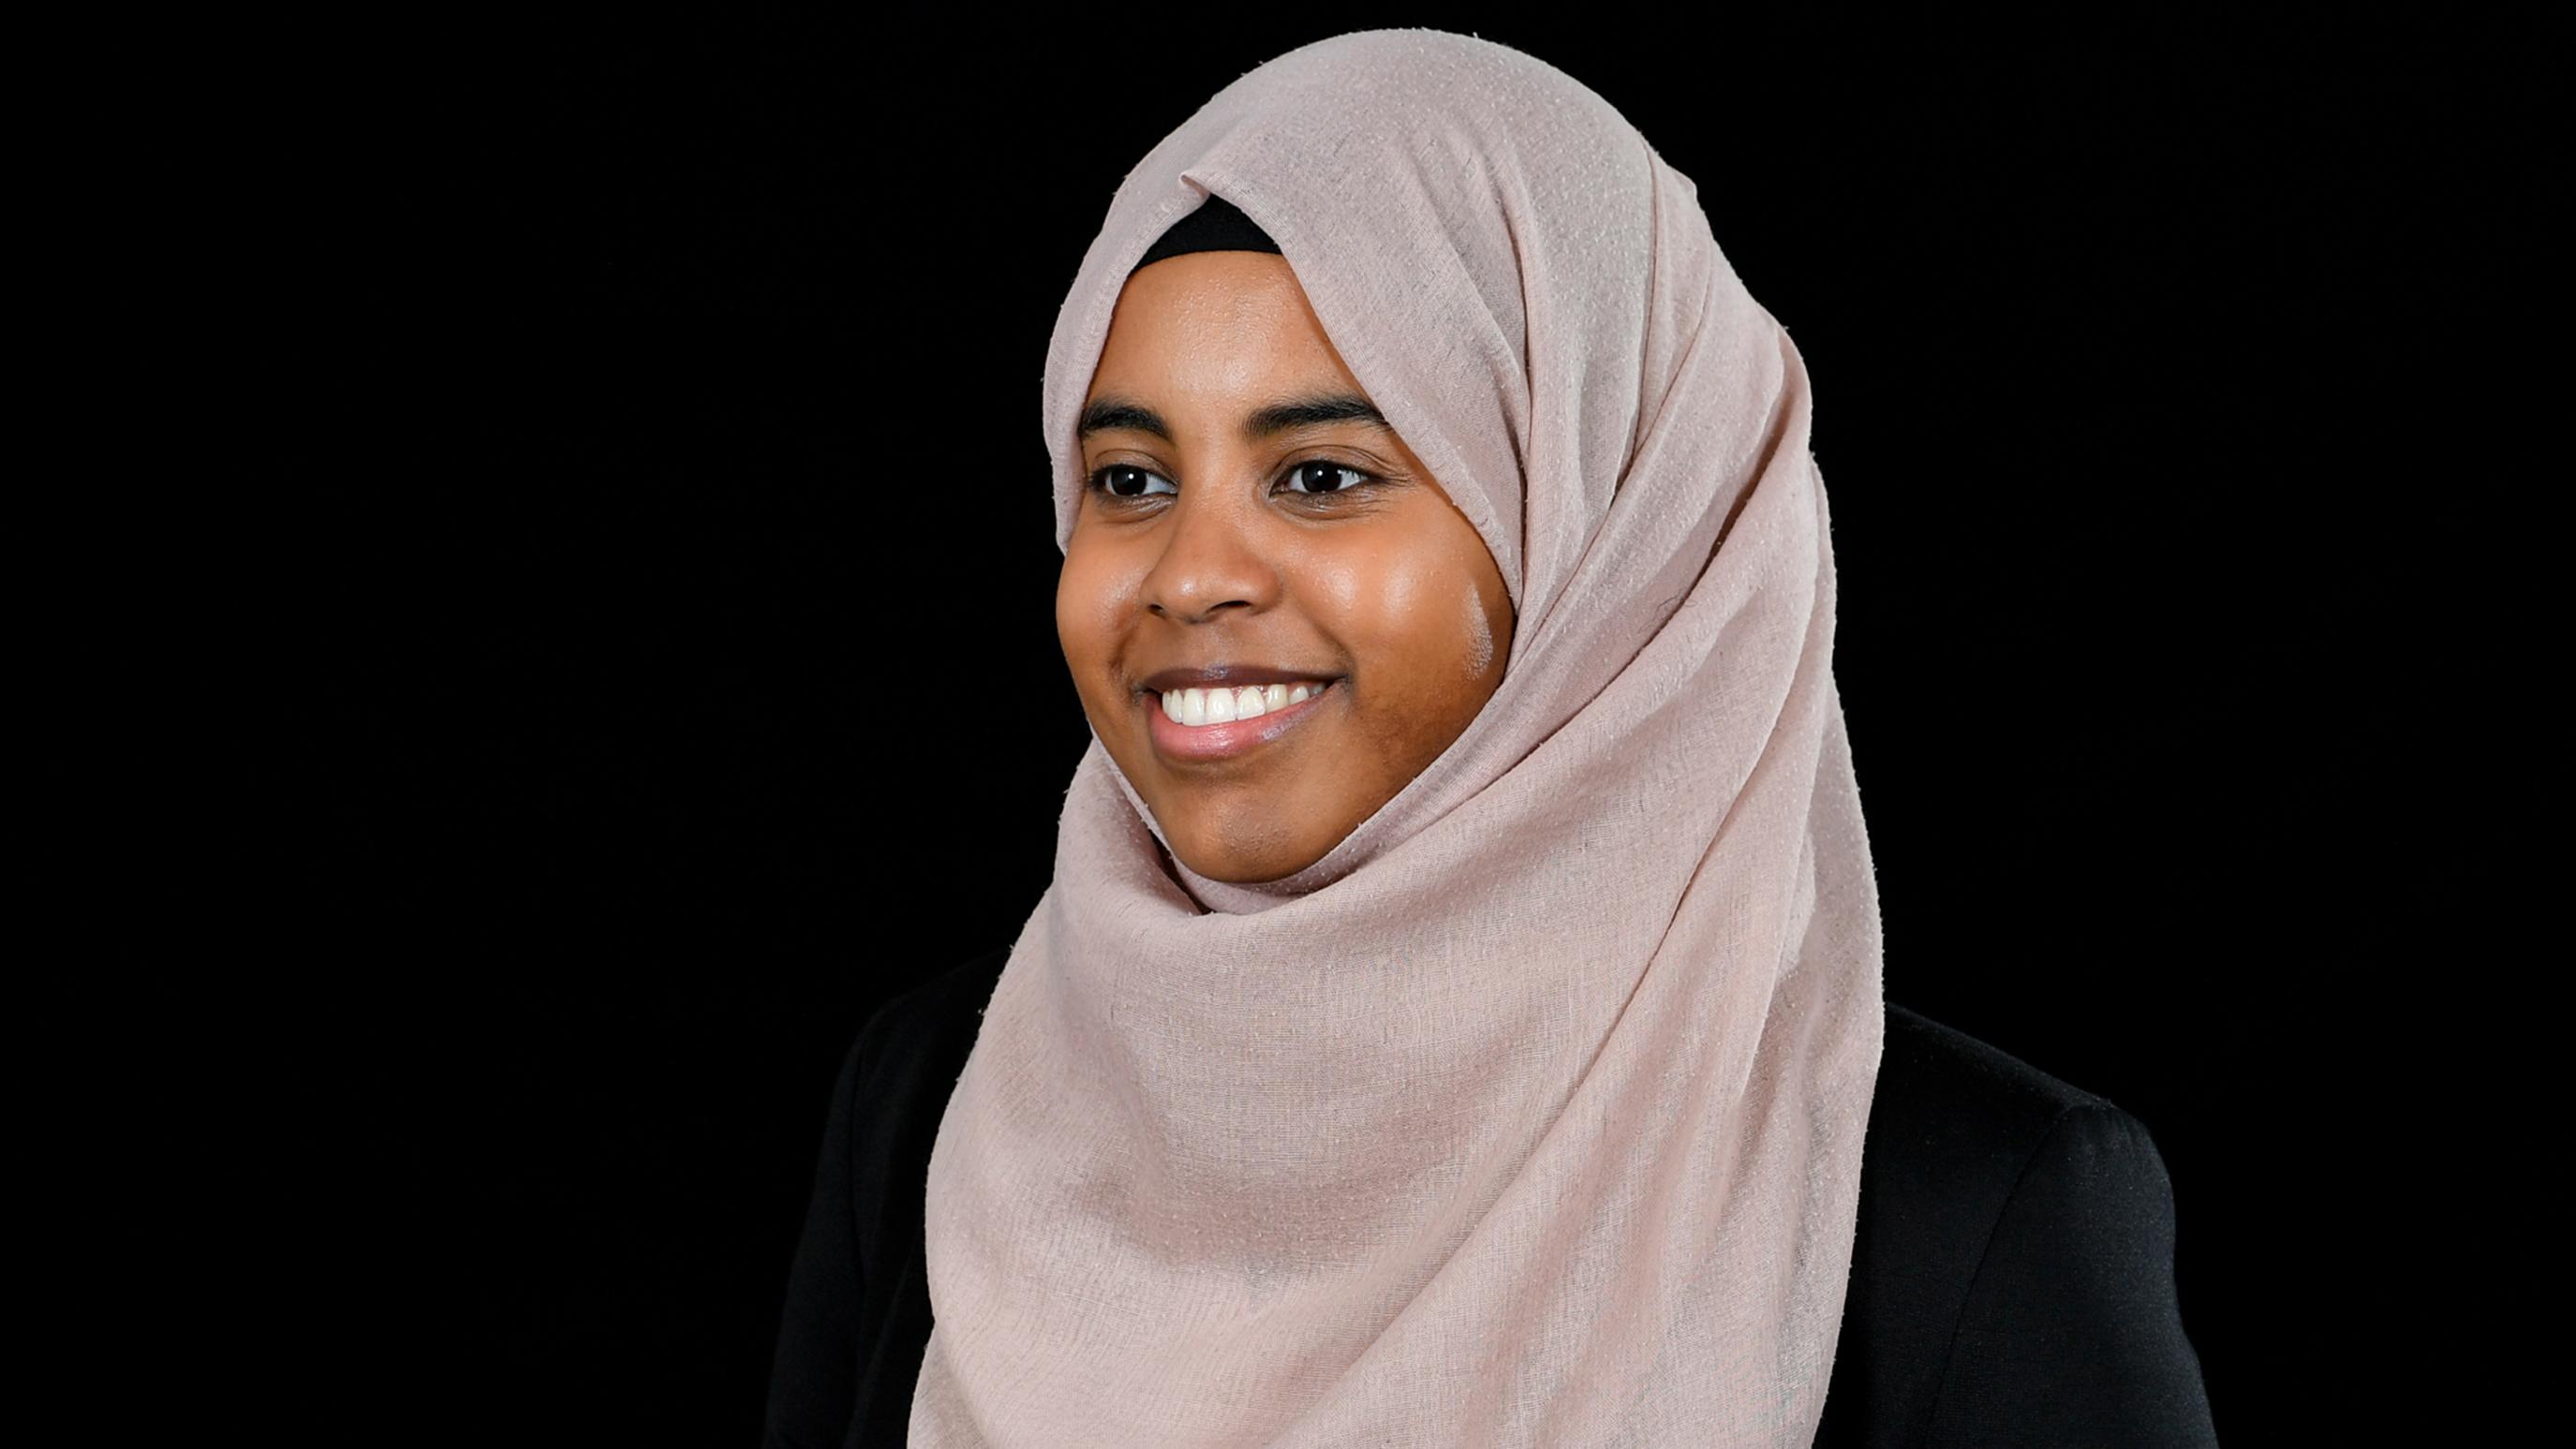 Mariam Basher